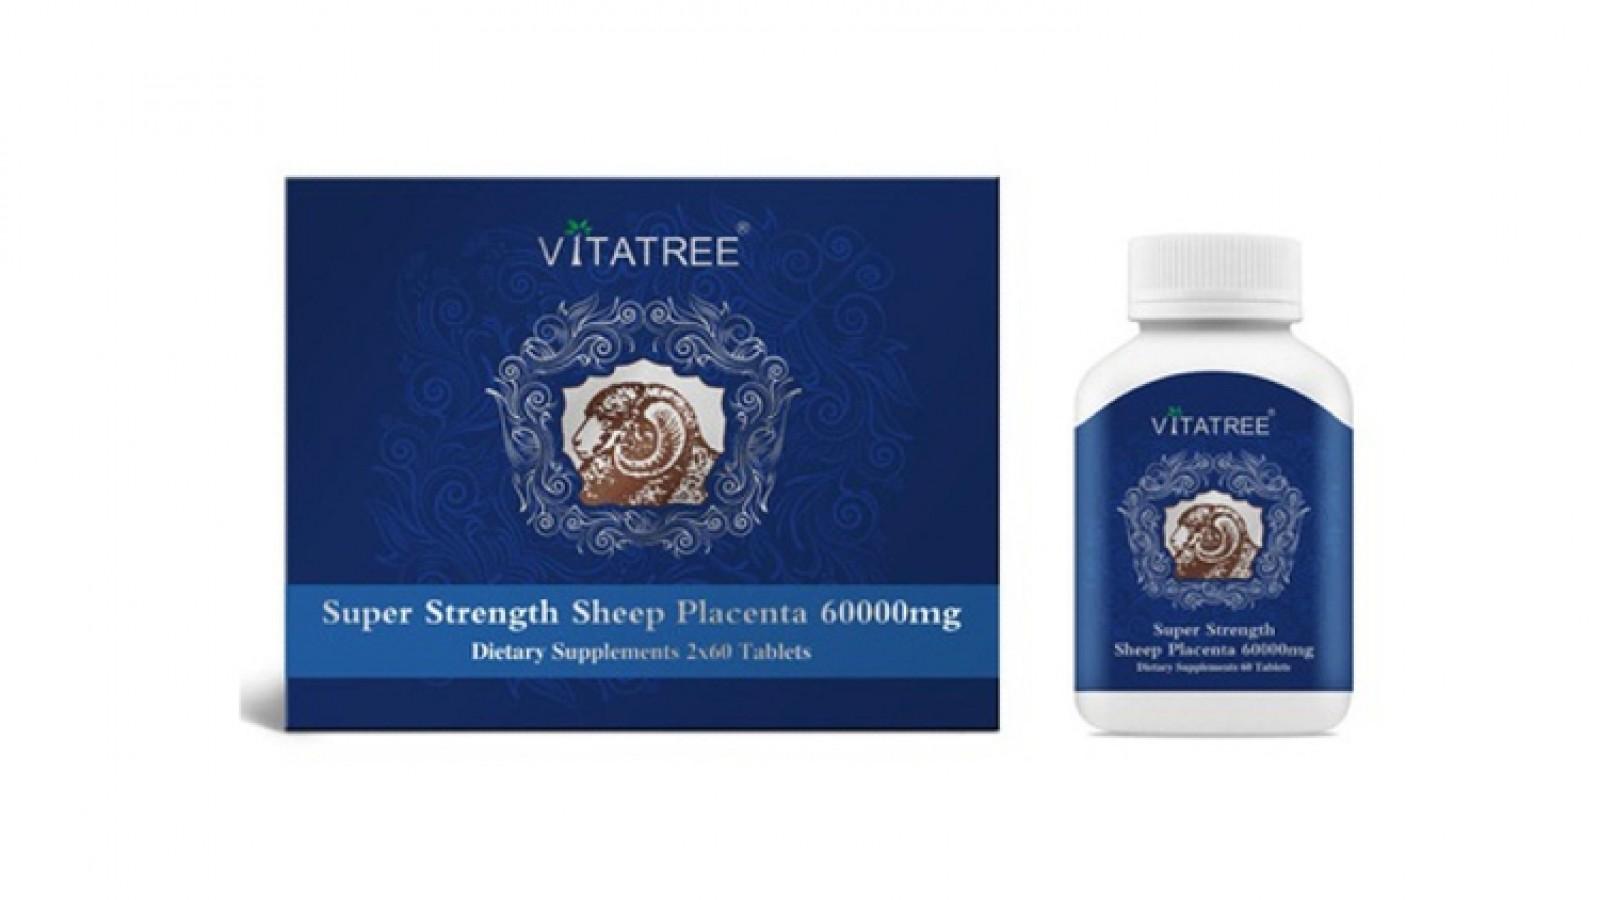 Nhau Thai Cừu Vitatree Super Strength Sheep Placenta 60000mg